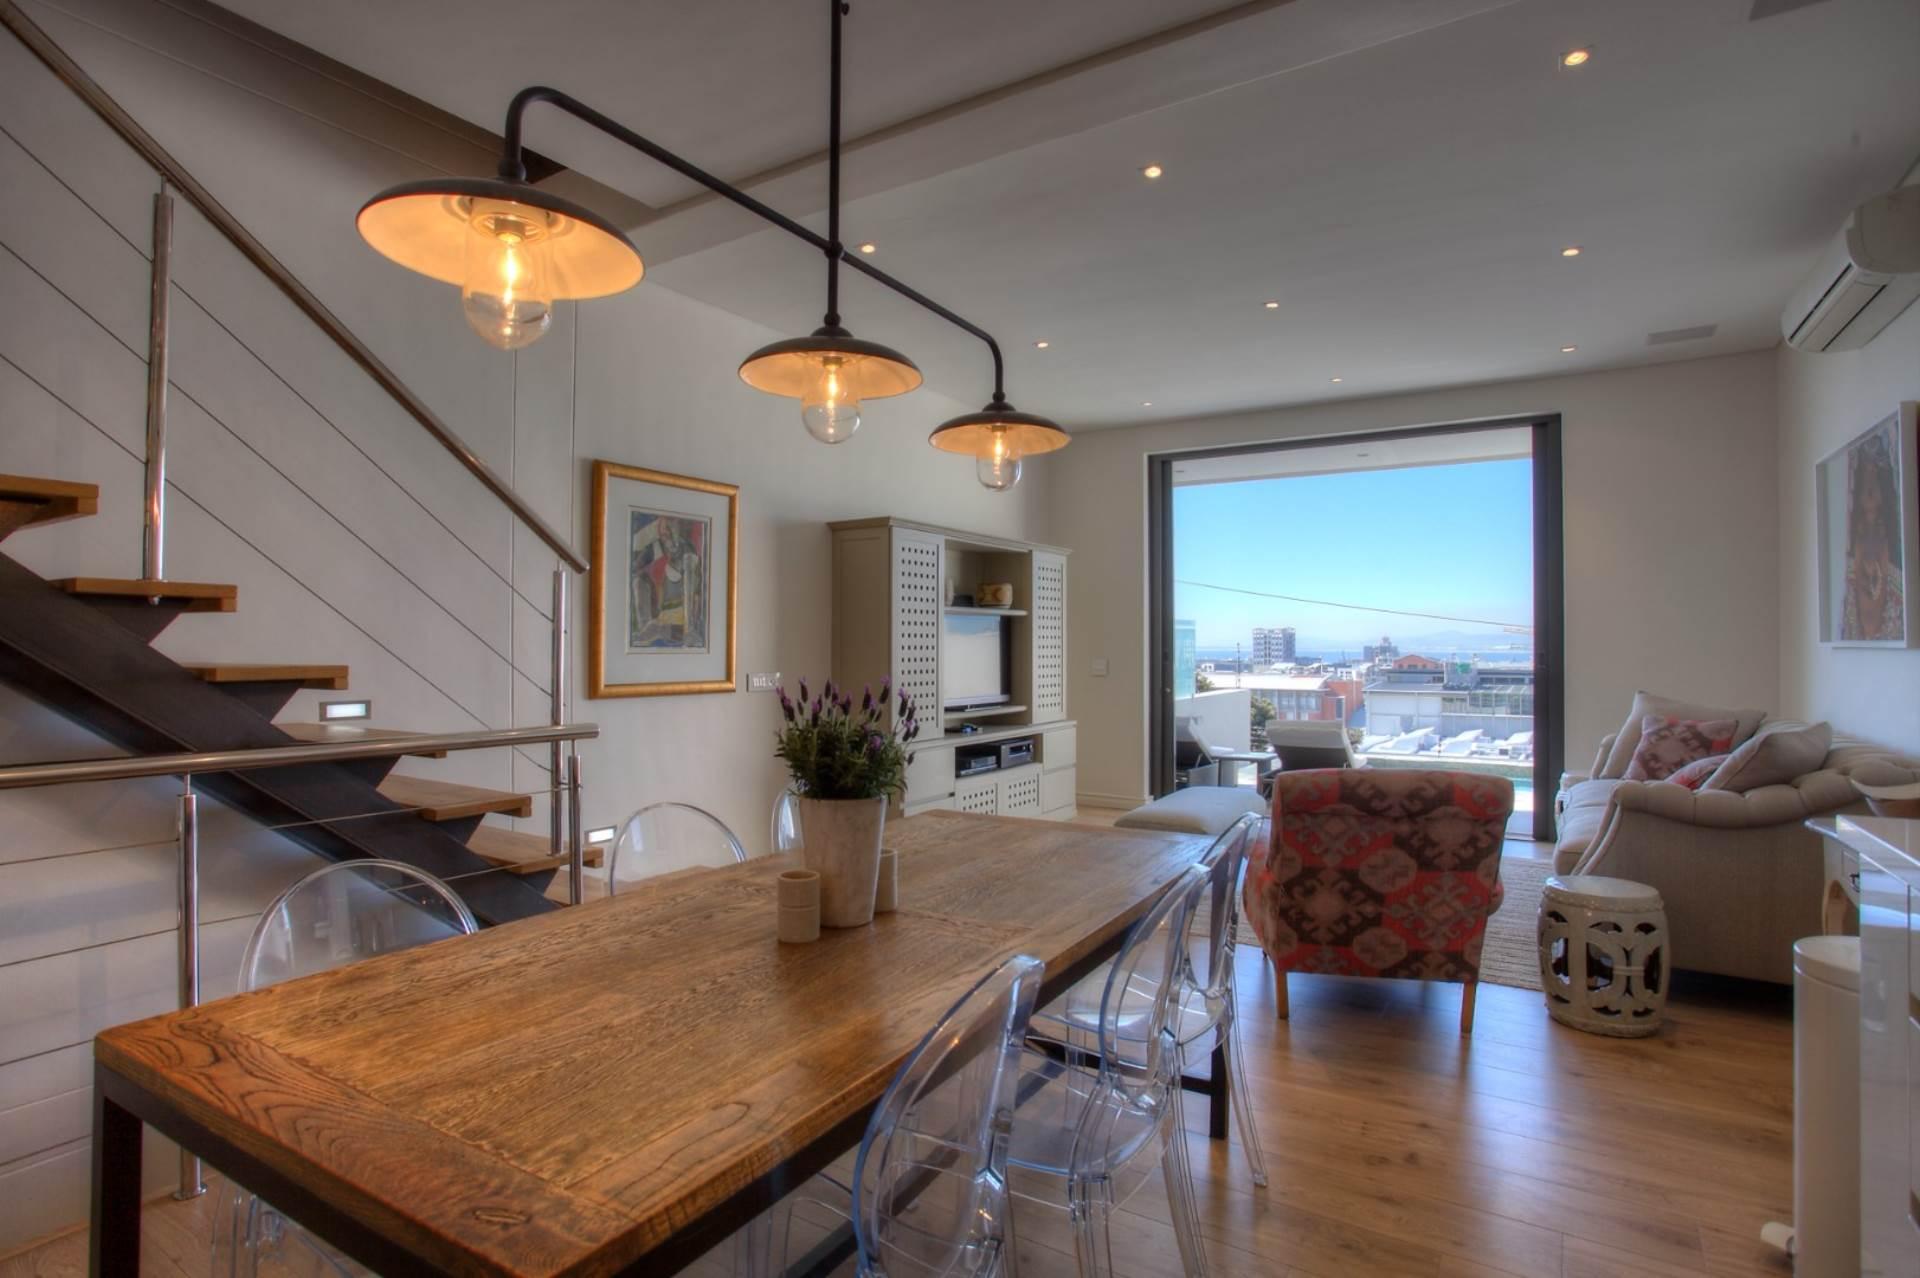 De Waterkant property for sale. Ref No: 13533994. Picture no 9